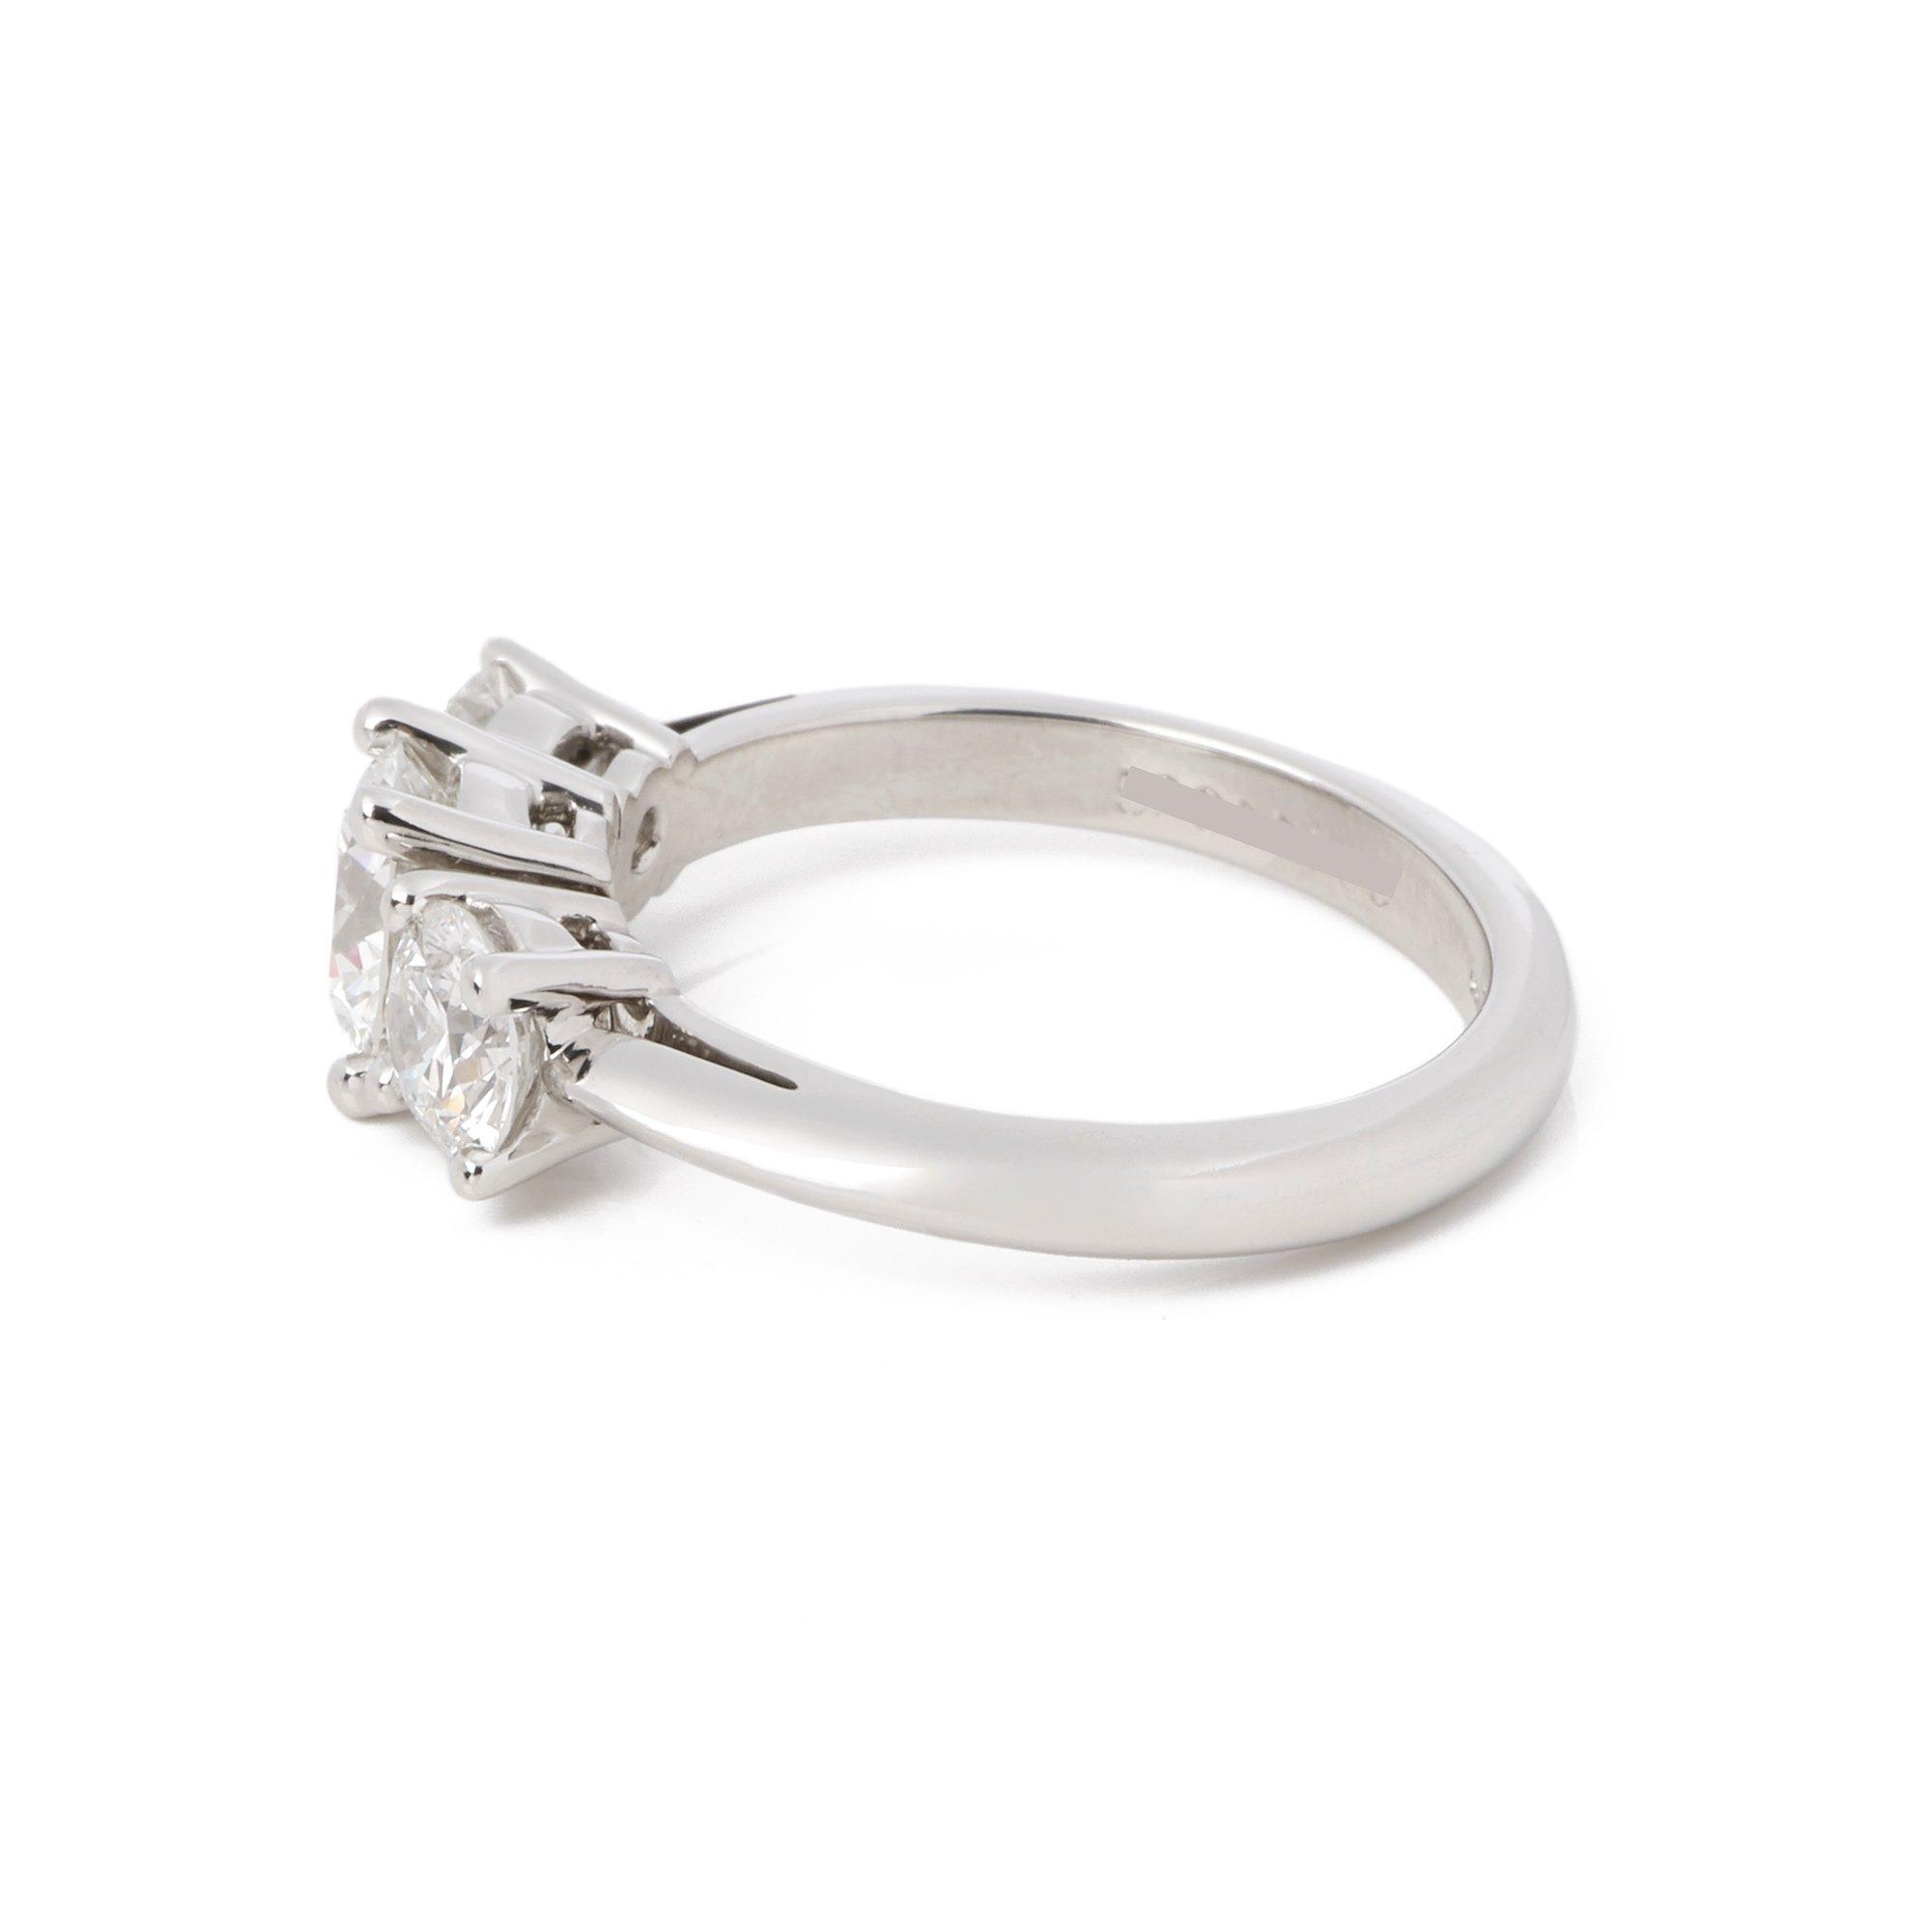 Tiffany & Co. 1.4ct Diamond Trilogy Ring